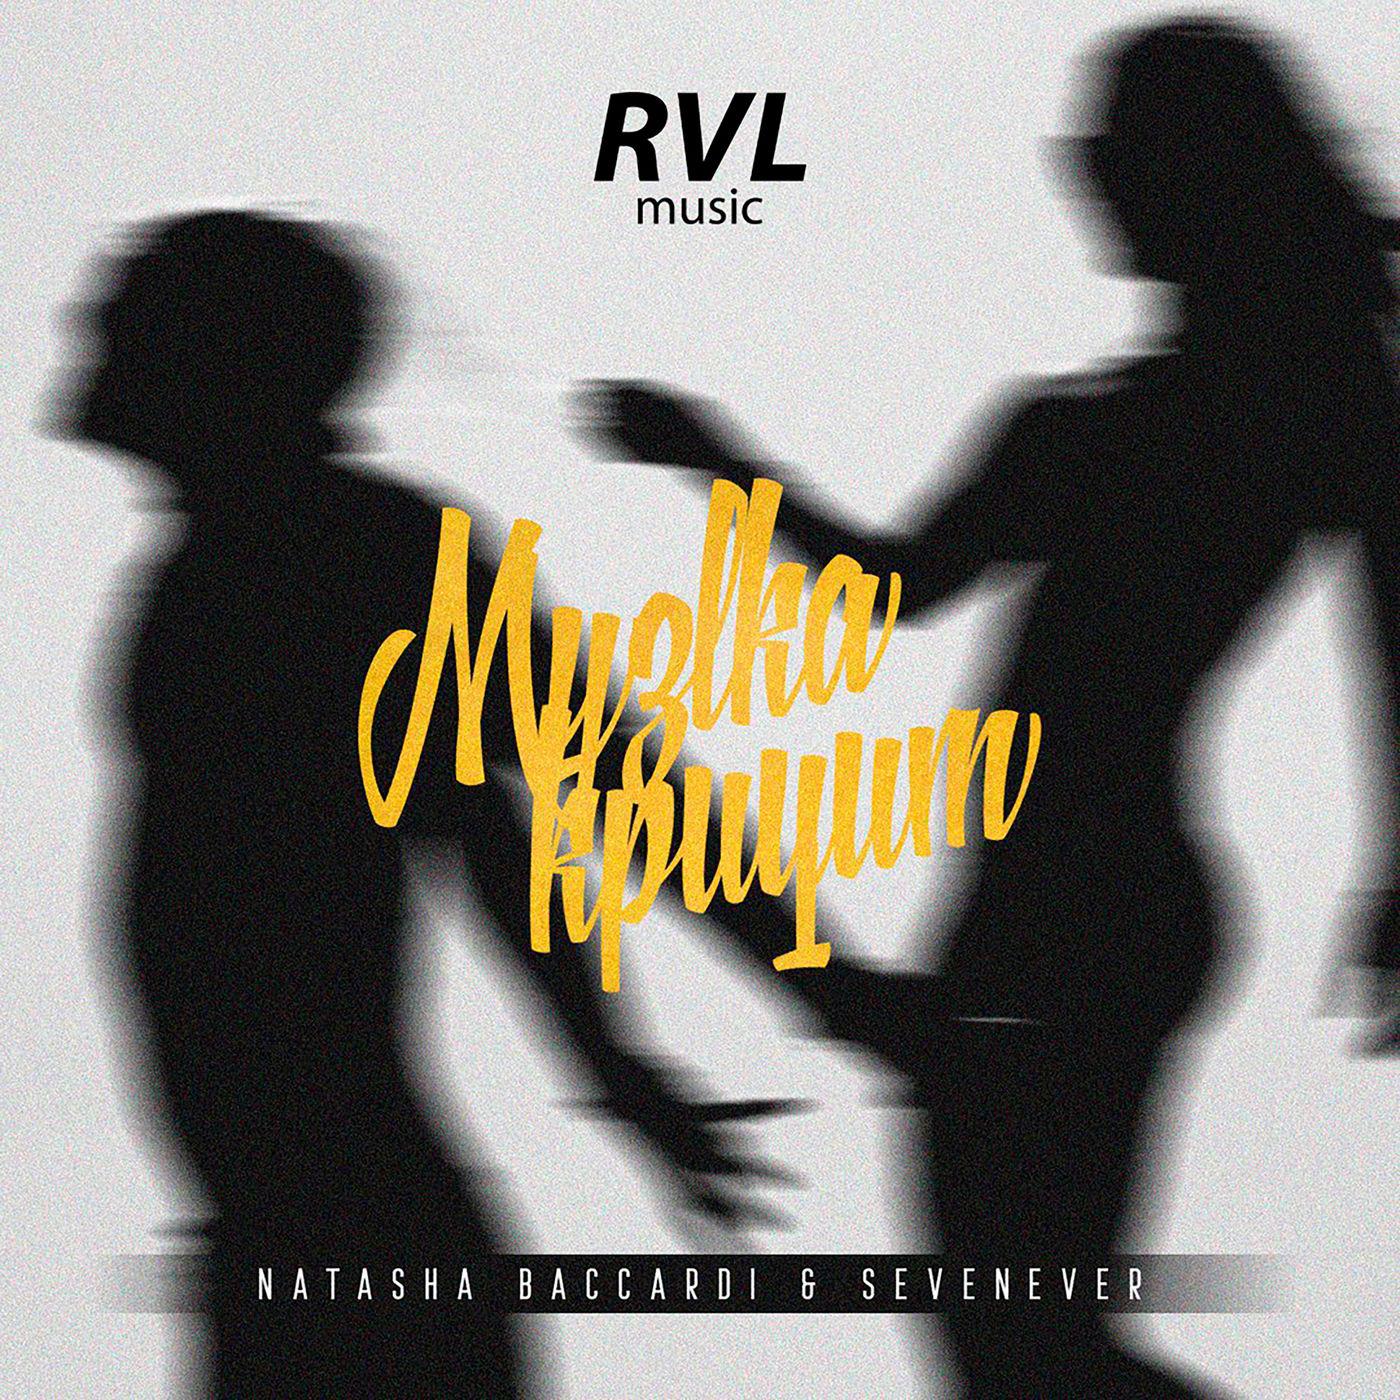 Natasha Baccardi, SevenEver - Музыка Кричит (Original Mix)